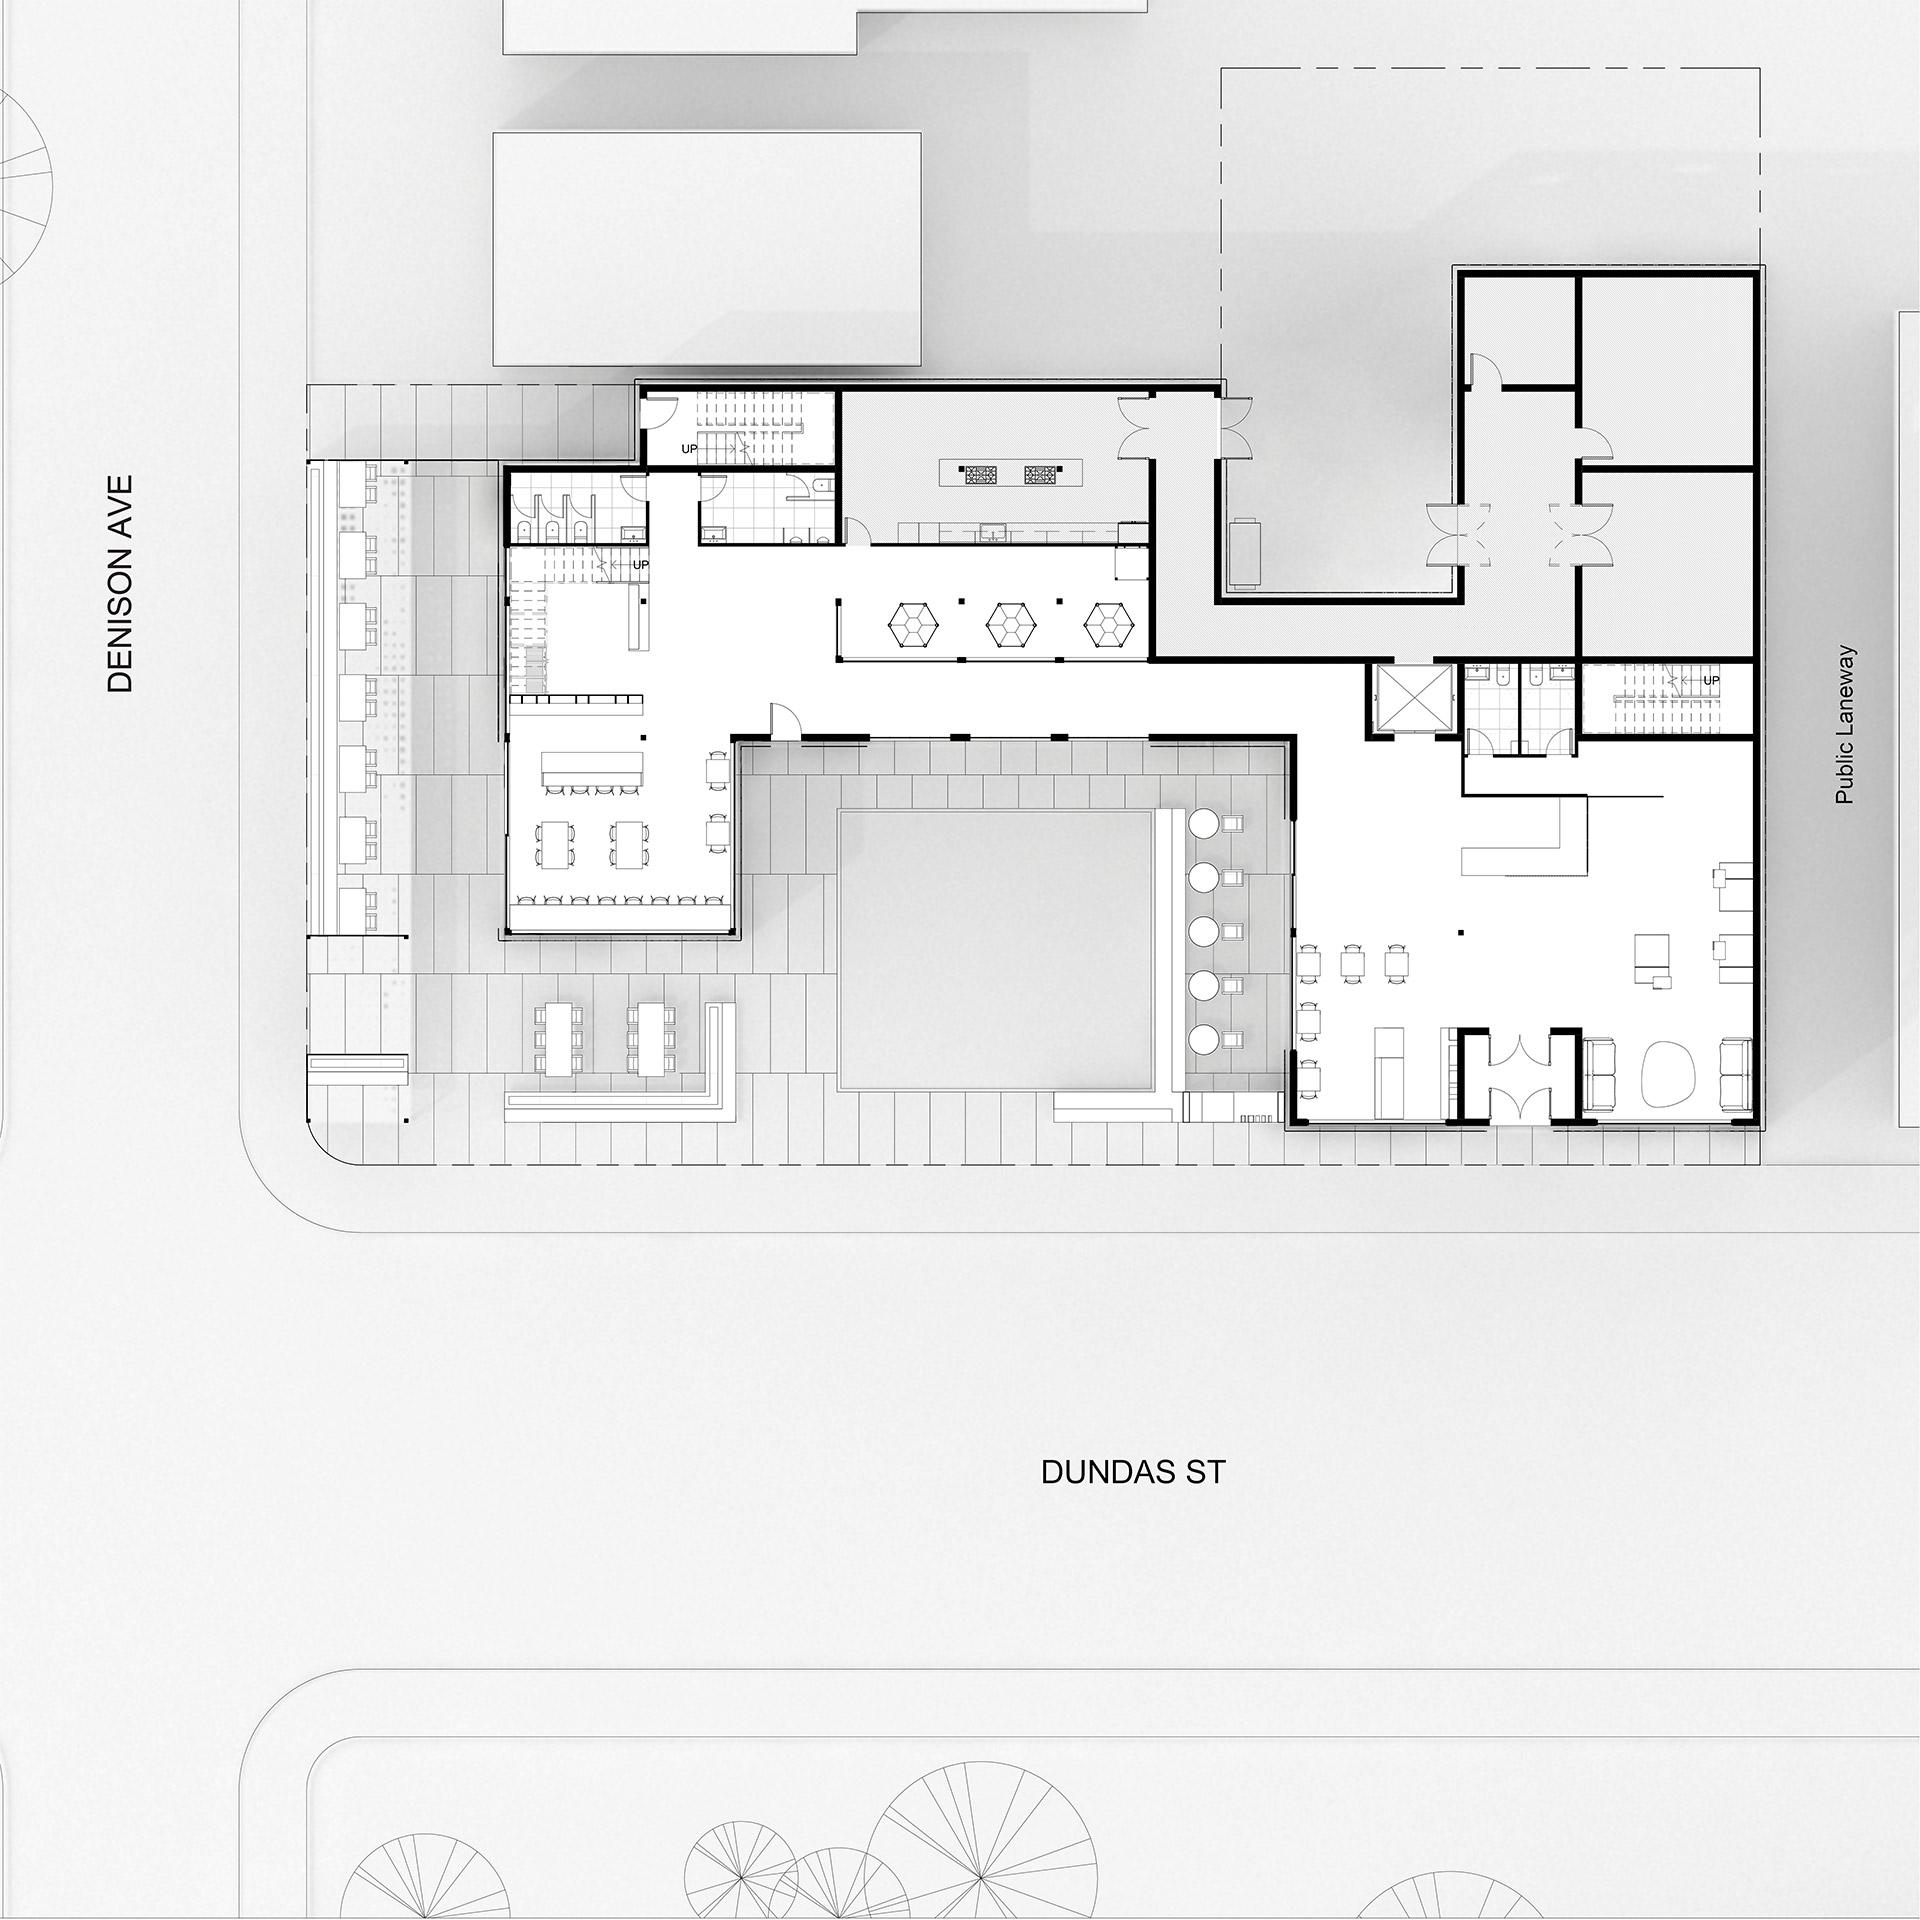 C7 Hotel + Brewery - Site Plan — Timothy Mandody